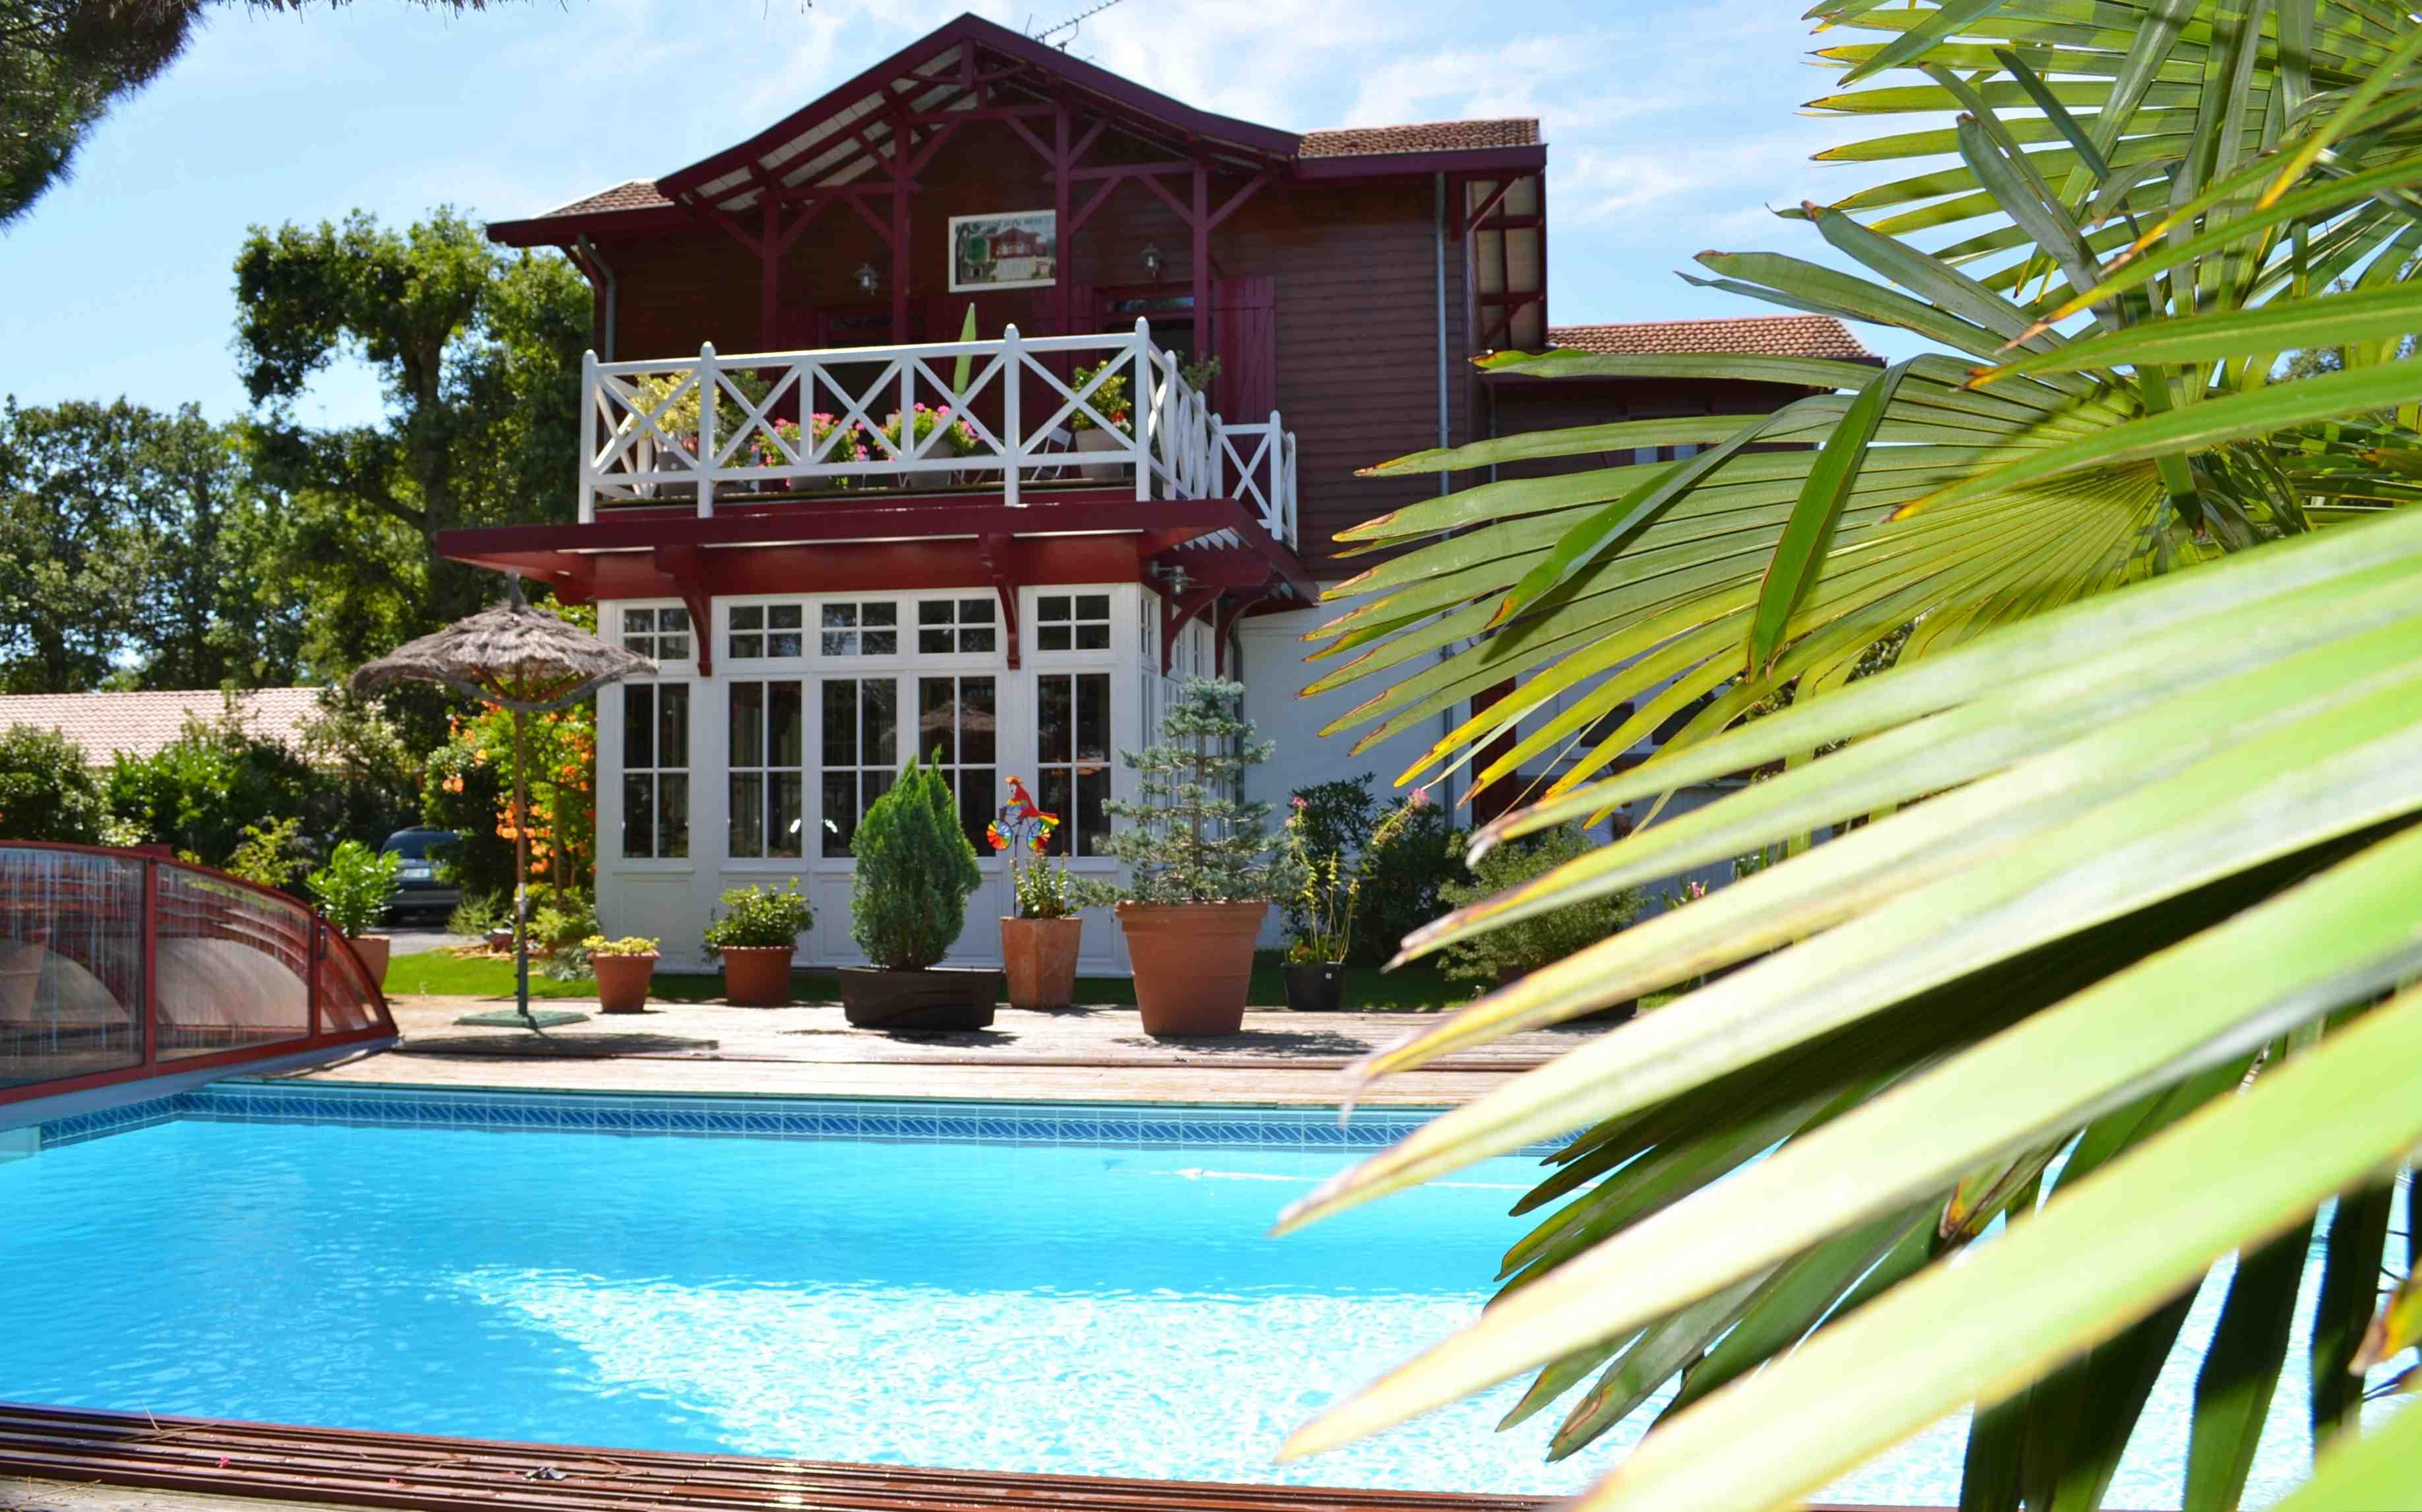 Chambre D Hote Villa Saint Barth Gujan Mestras